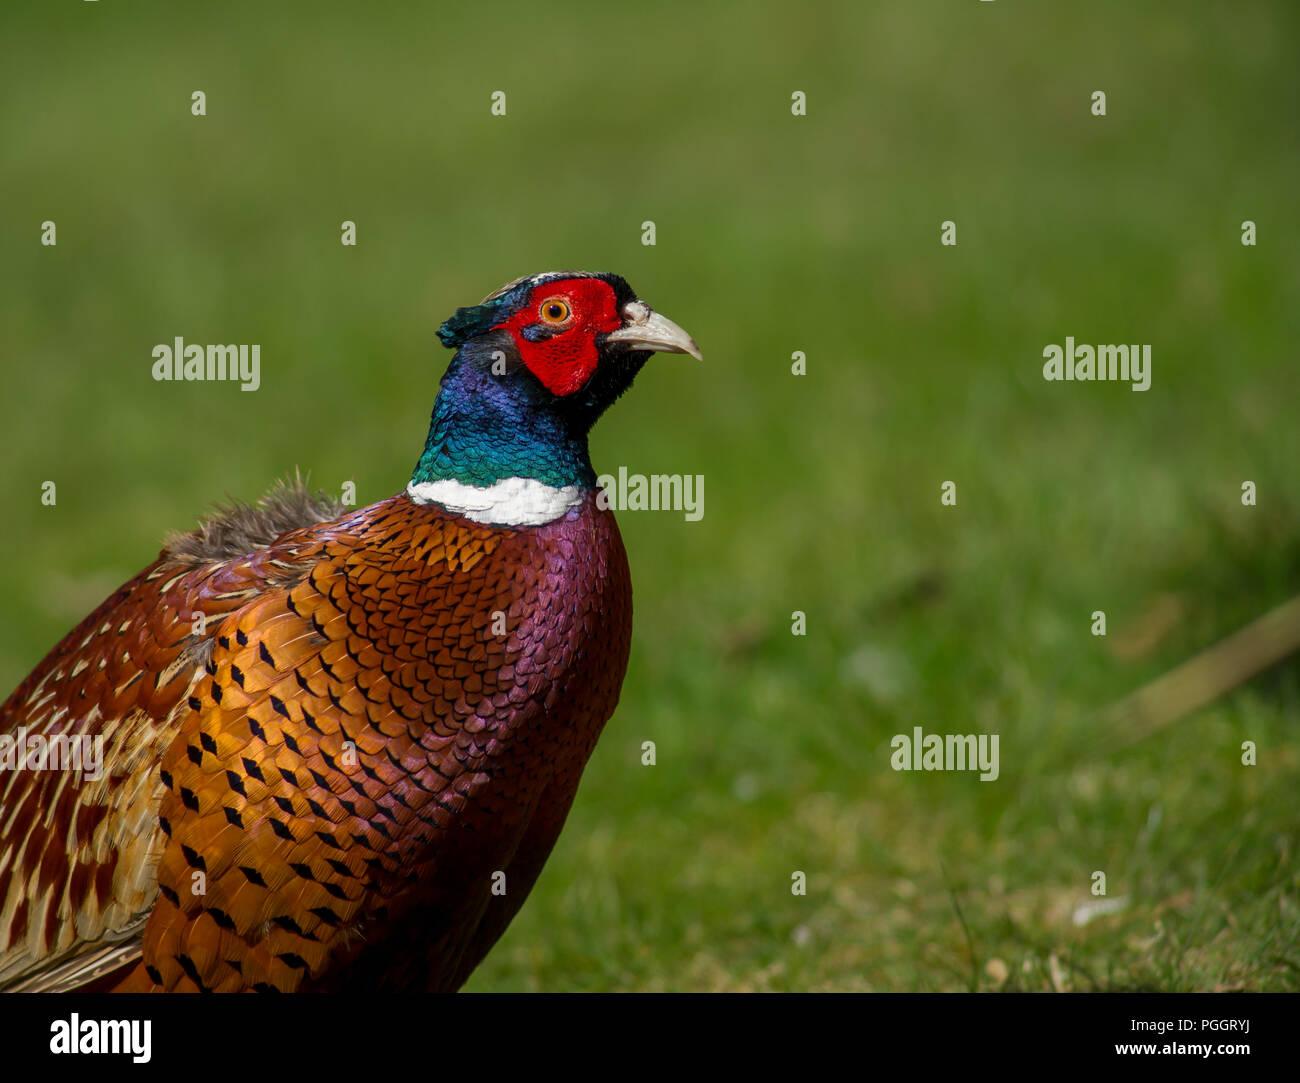 Right facing portrait of male common pheasant, Phasianus colchicus. - Stock Image